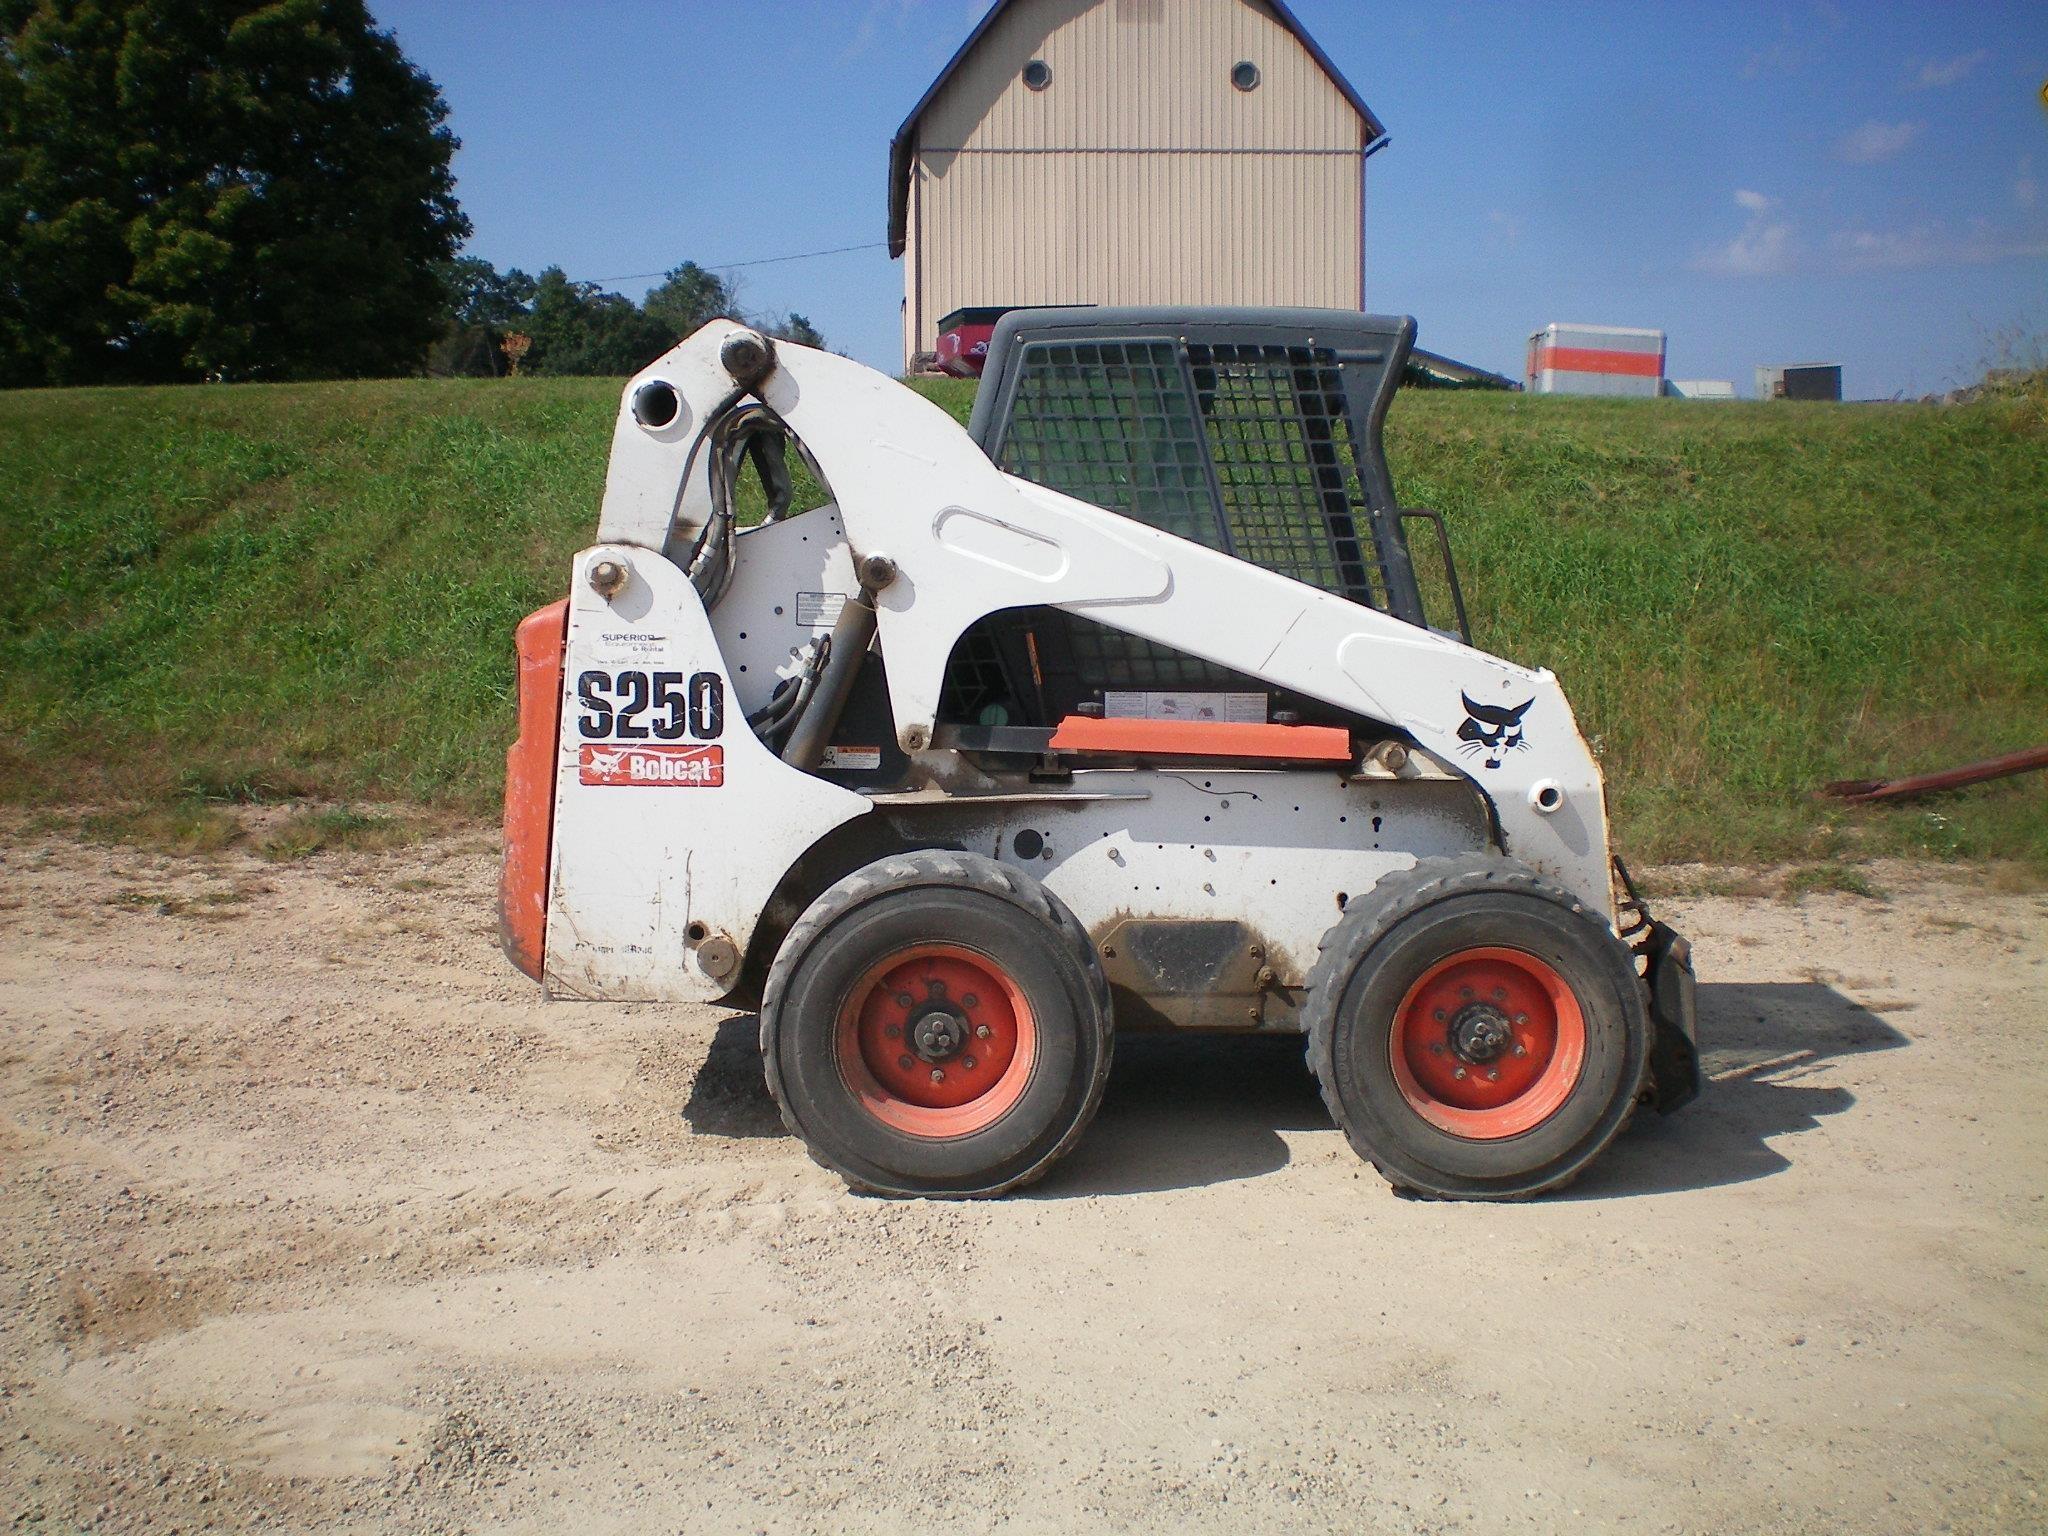 2006 Bobcat S250 Skid Steer